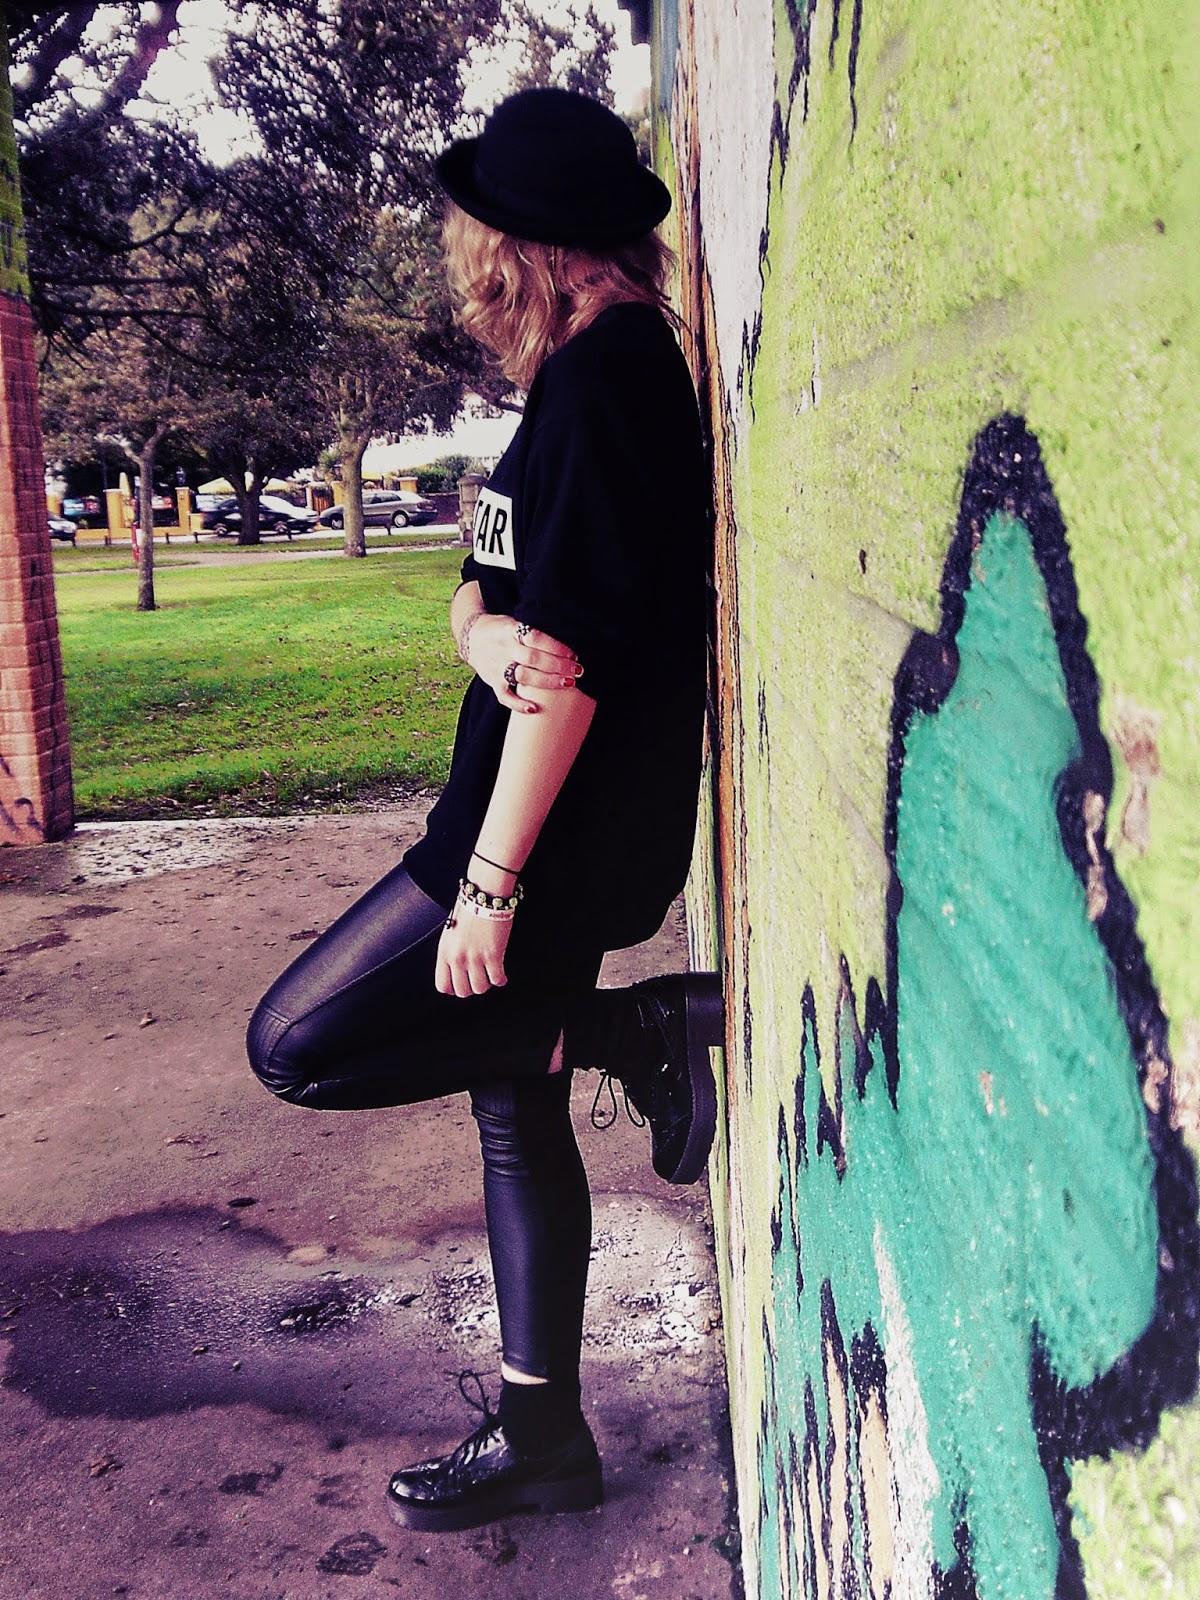 bowler hat, faux fur coat, faux fur jacket, biker leggings, biker style, chunky shoes, platform shoes, ankle socks, zara jumper, choker, 90's, hipster ootd, hipster, autumn ootd, autumn outfit